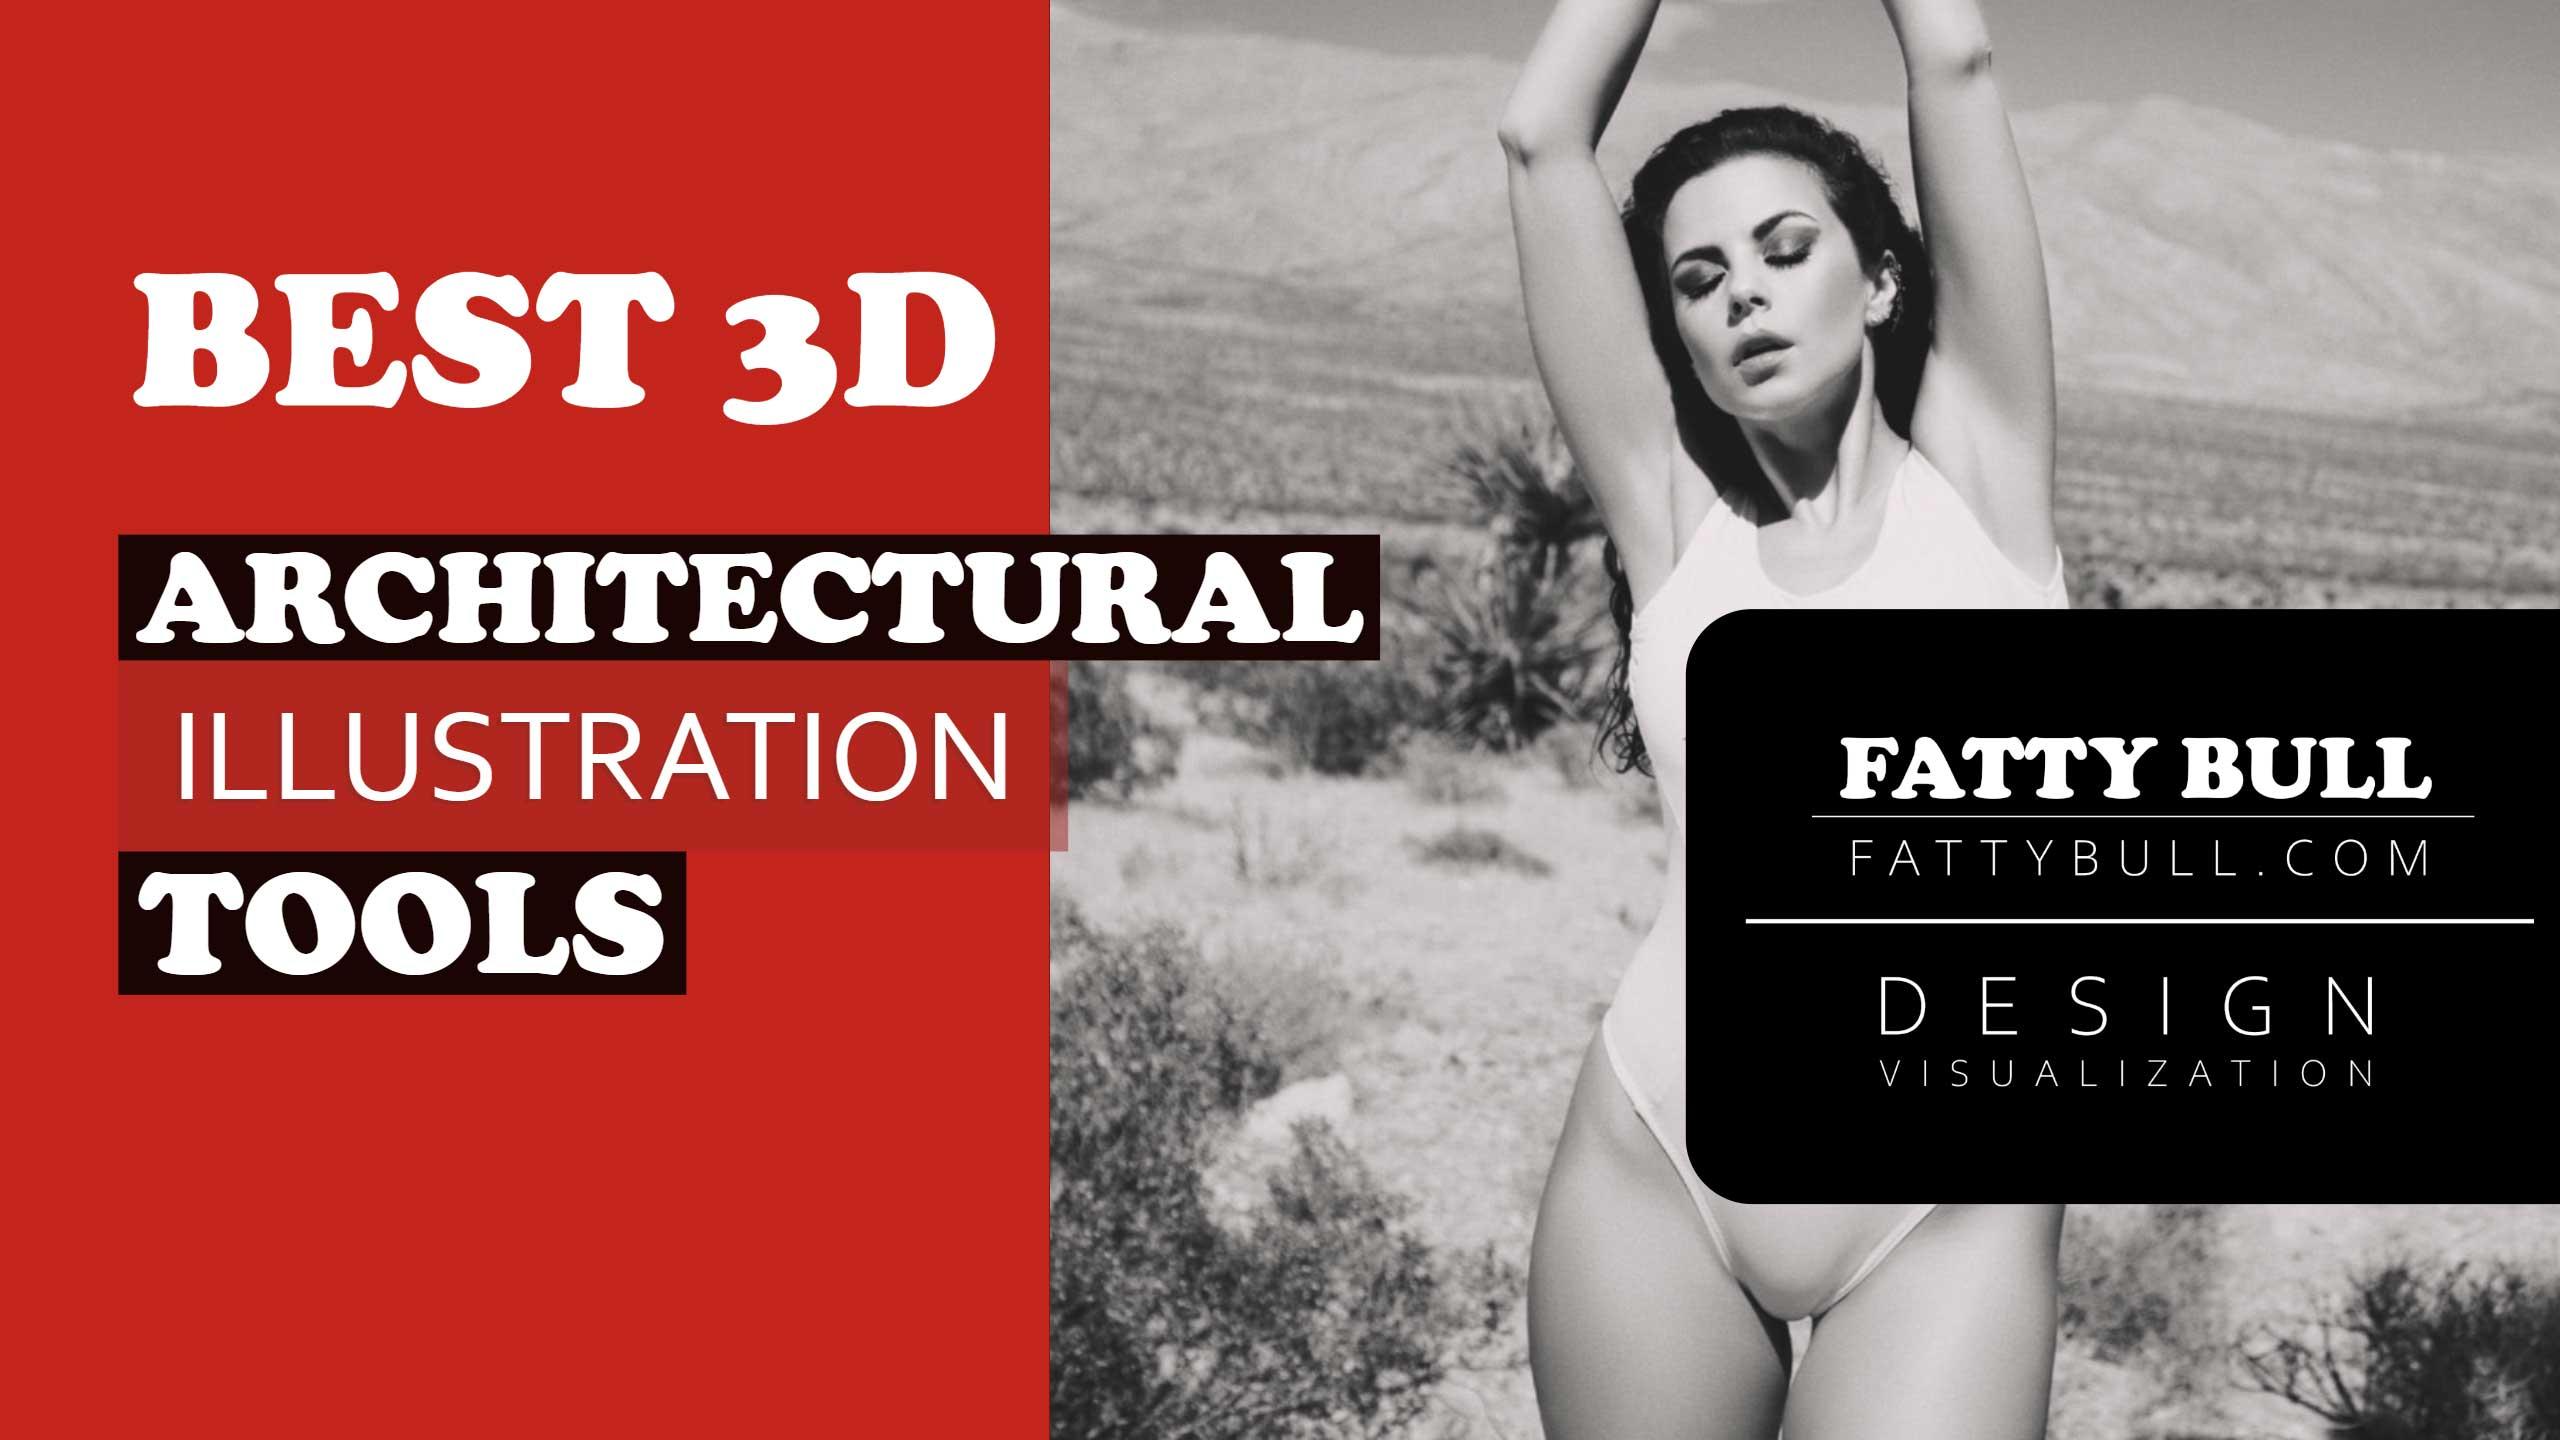 Best 3D-Architectural-Illustration-Tools